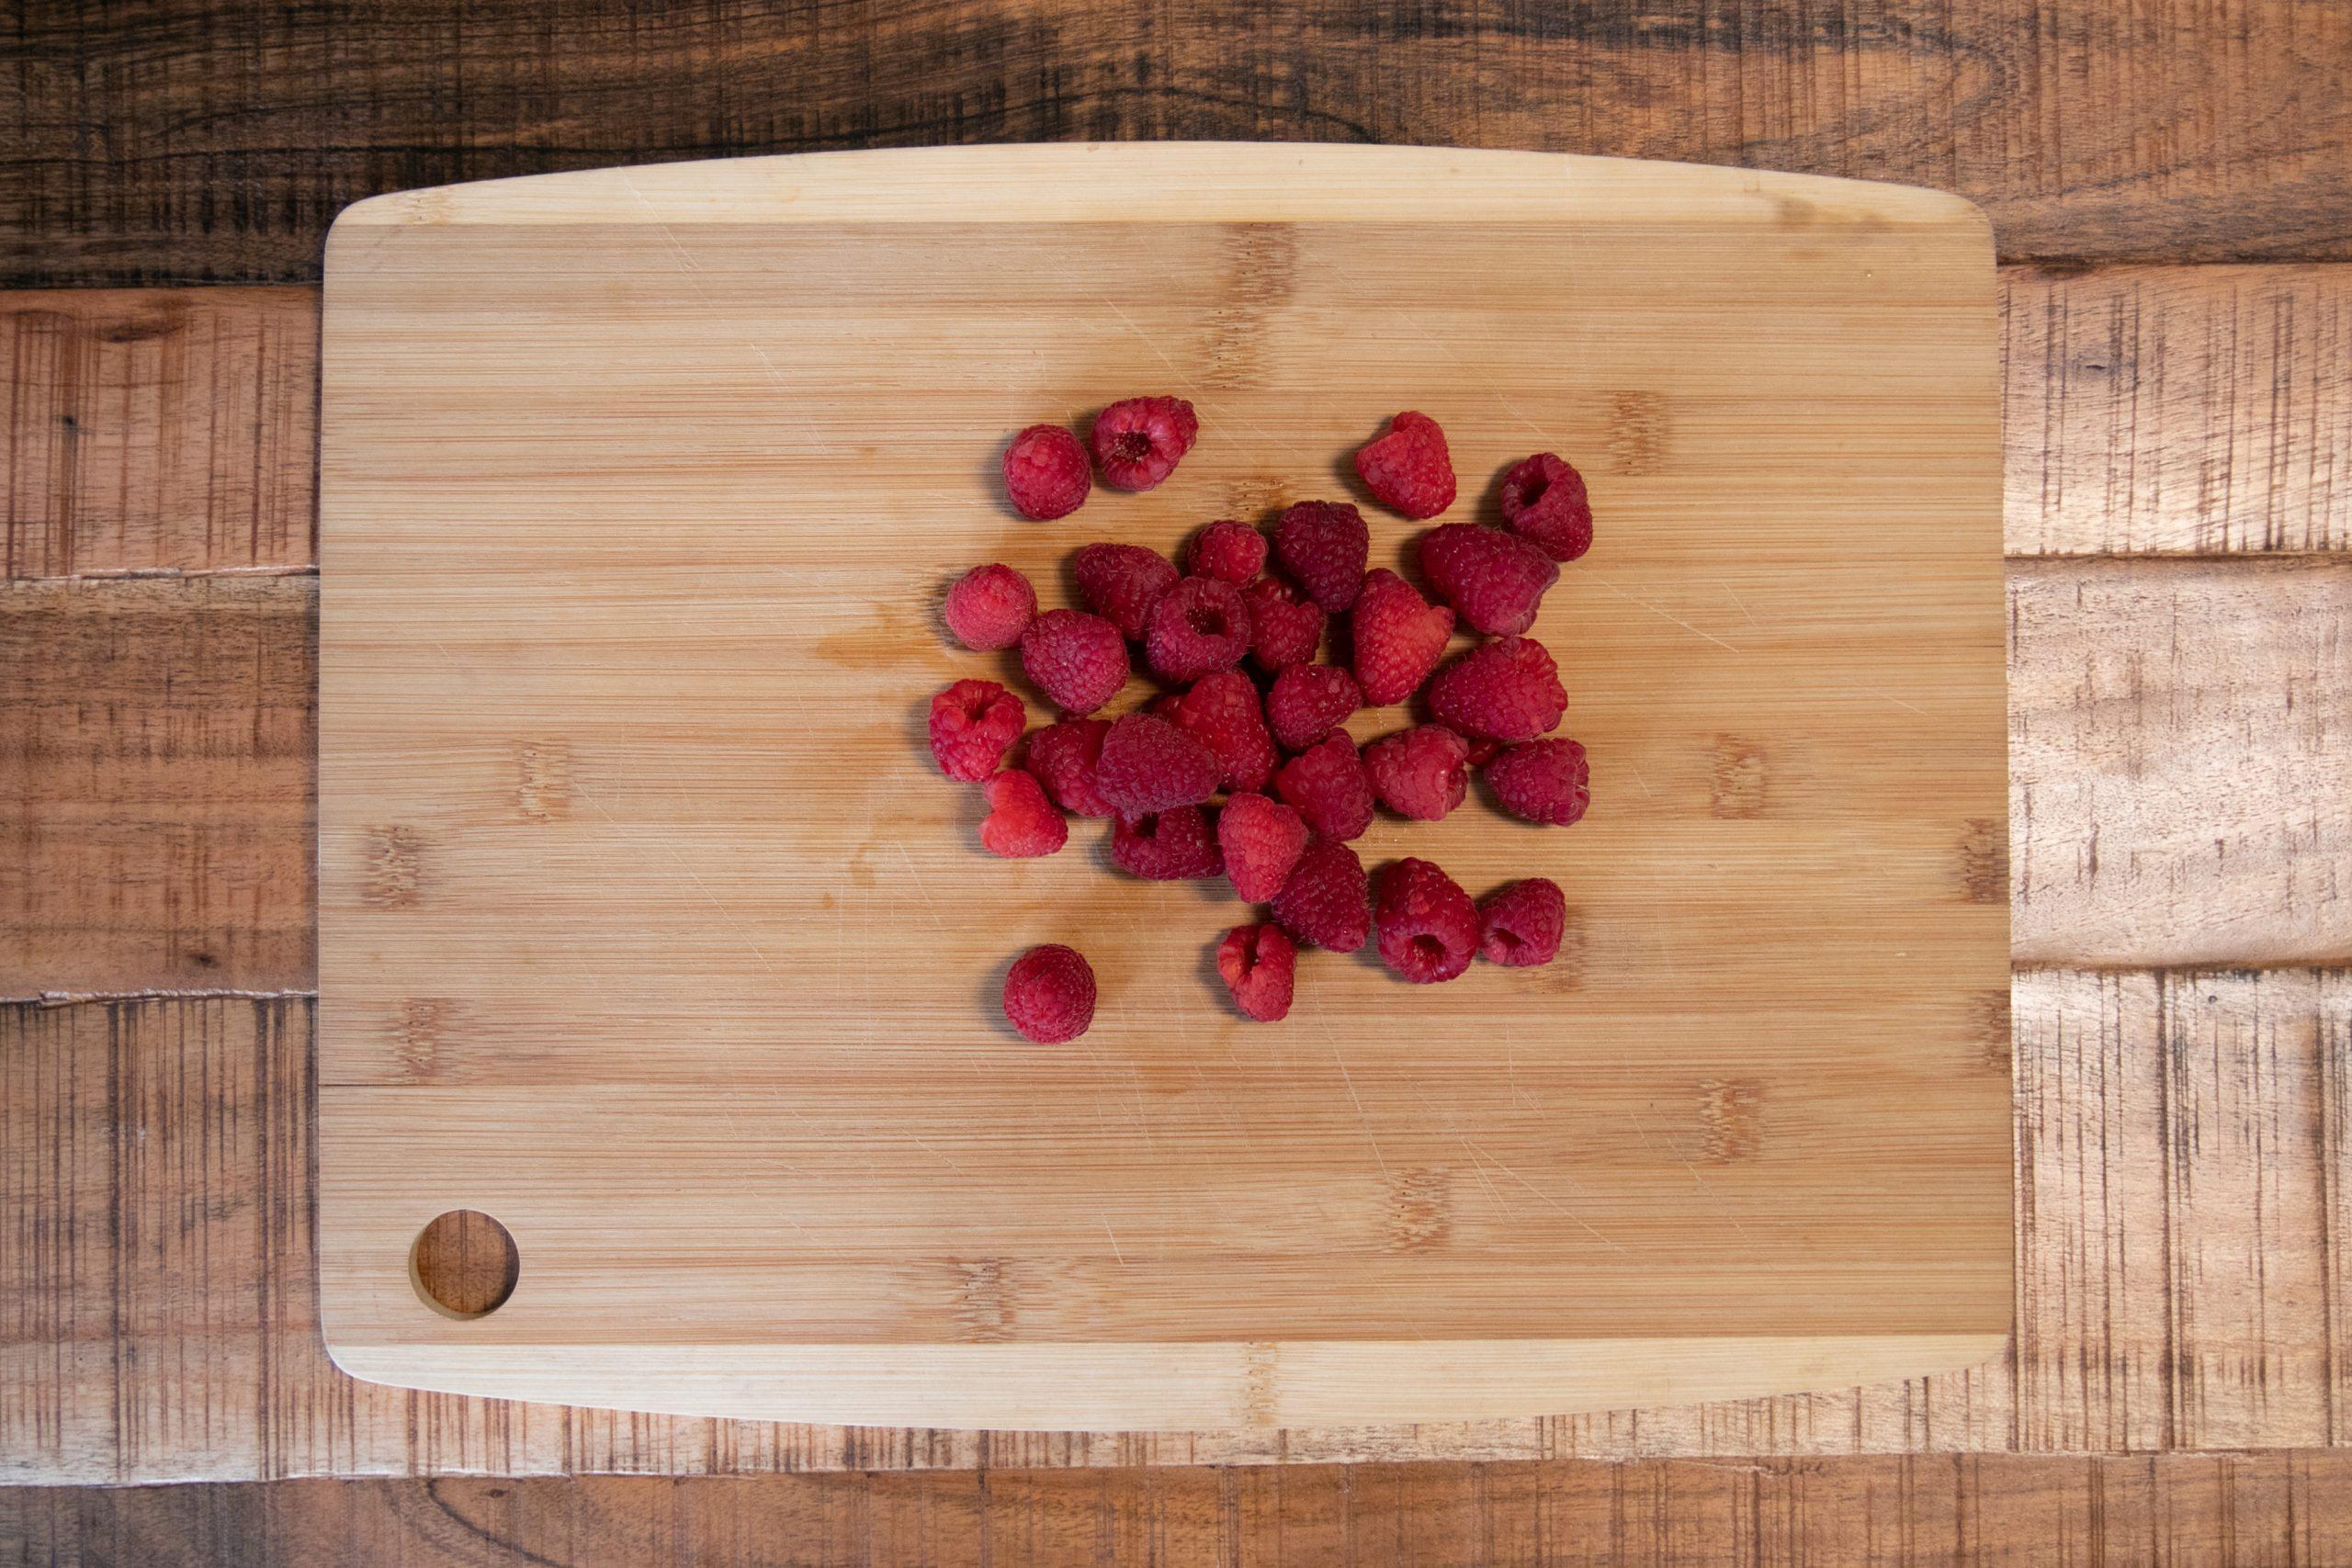 Handful Of Raspberries On Wooden Cutting Board